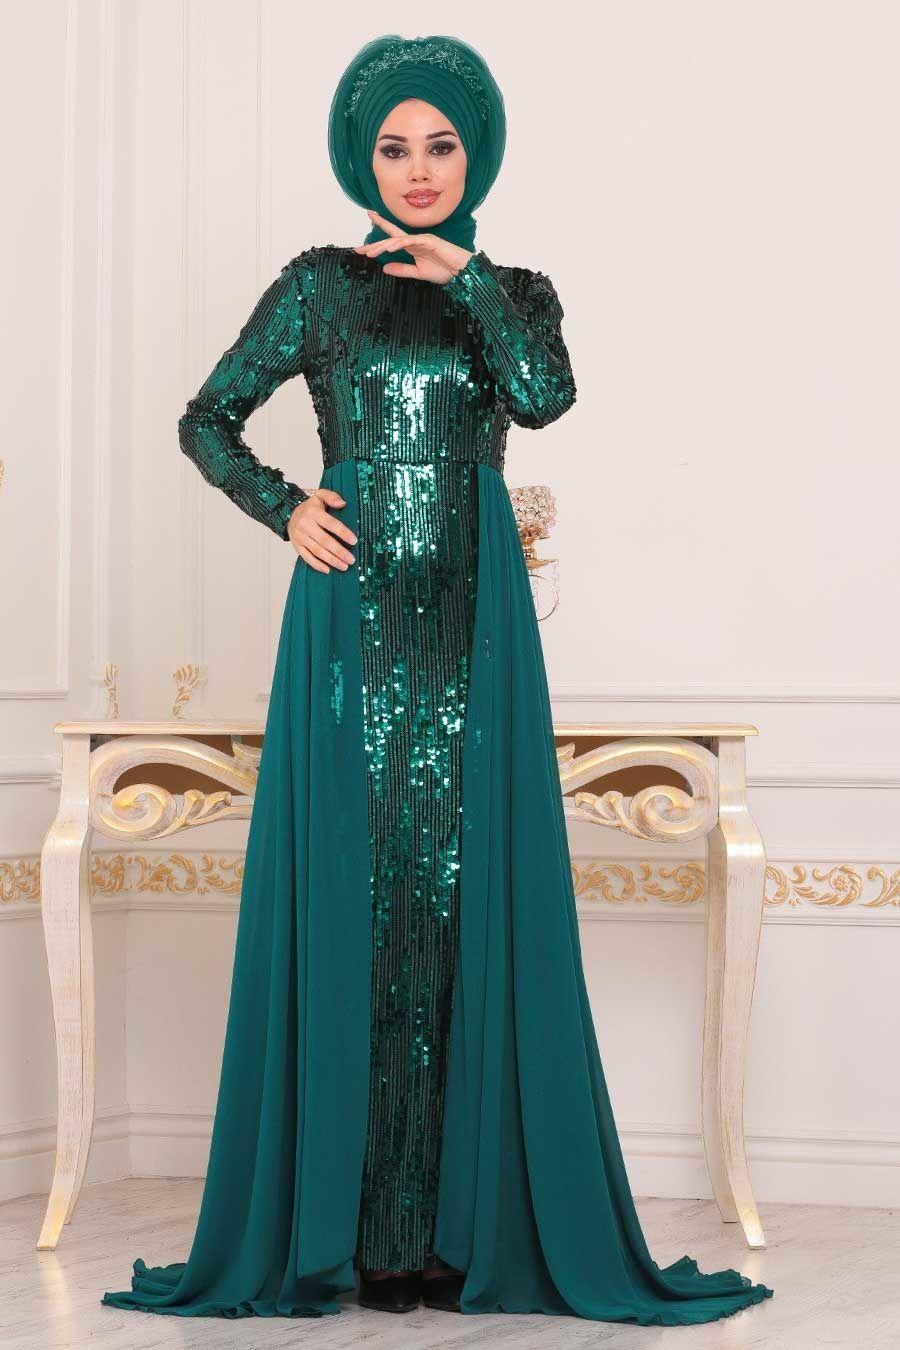 Mango Sirt Dekolteli Askili Yesil Payetli Mini Abiye Elbise Elbisebul Payet Elbise The Dress Elbise